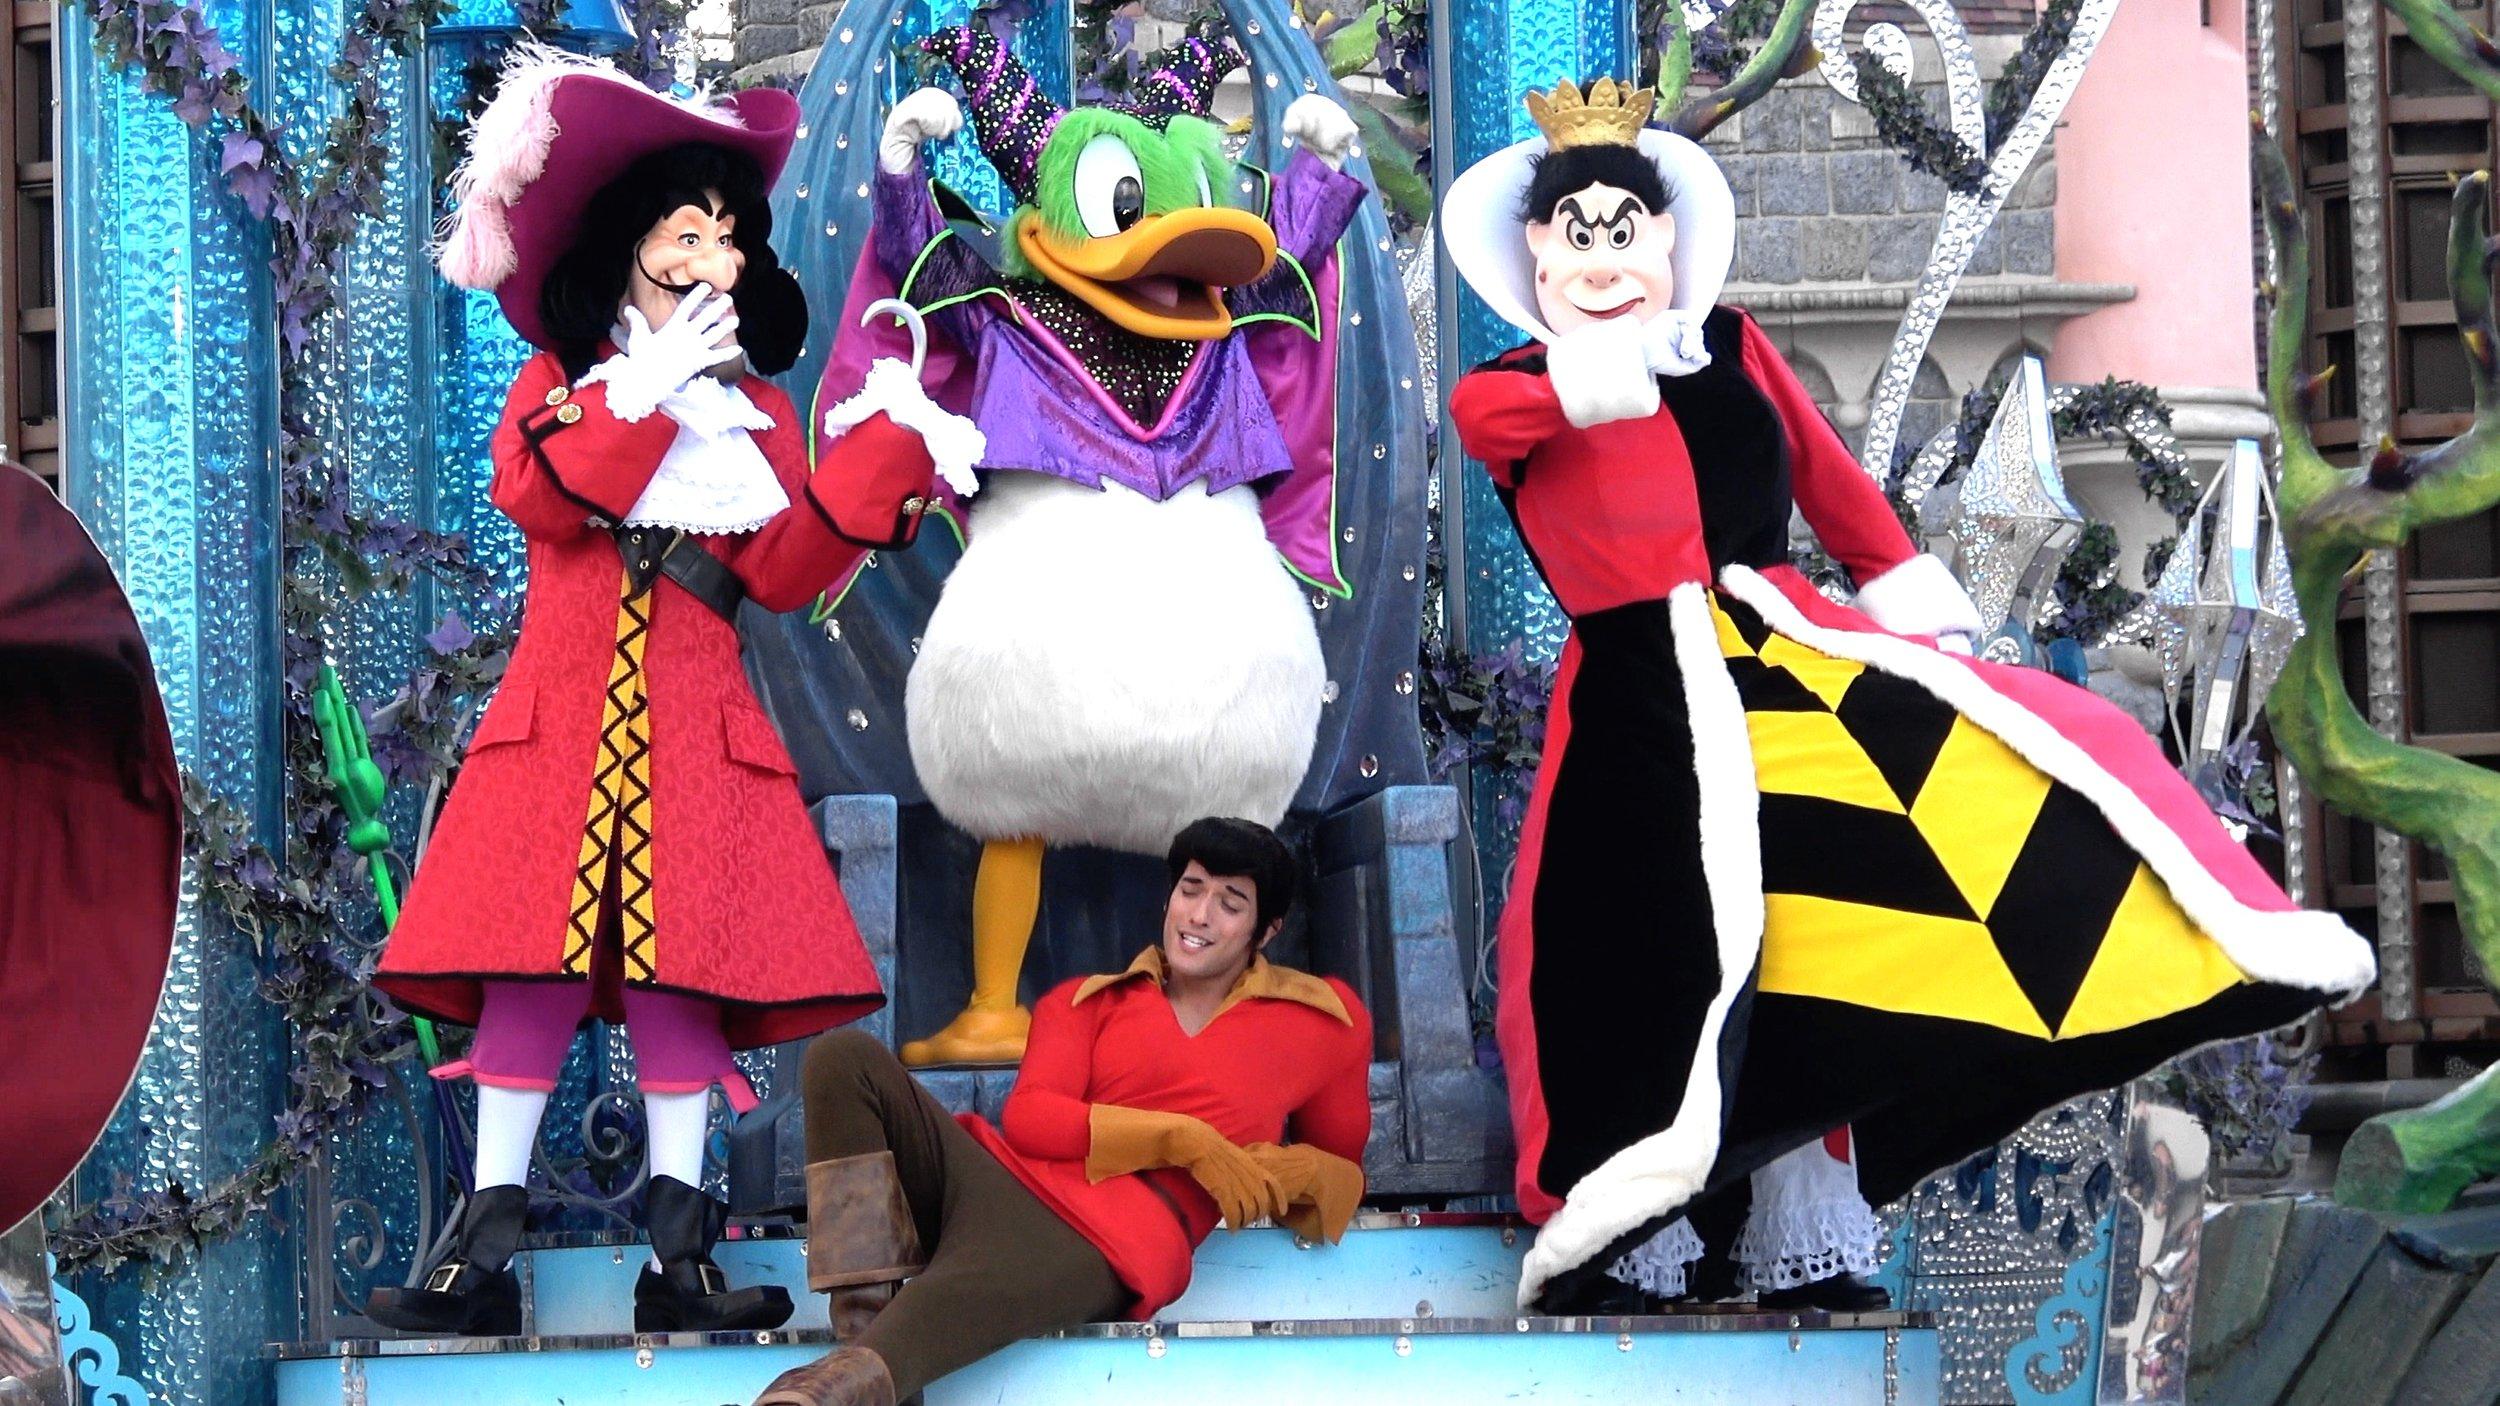 Halloween Disney Villains.Disney Villains Show It S Good To Be Bad Donald As Maleficent